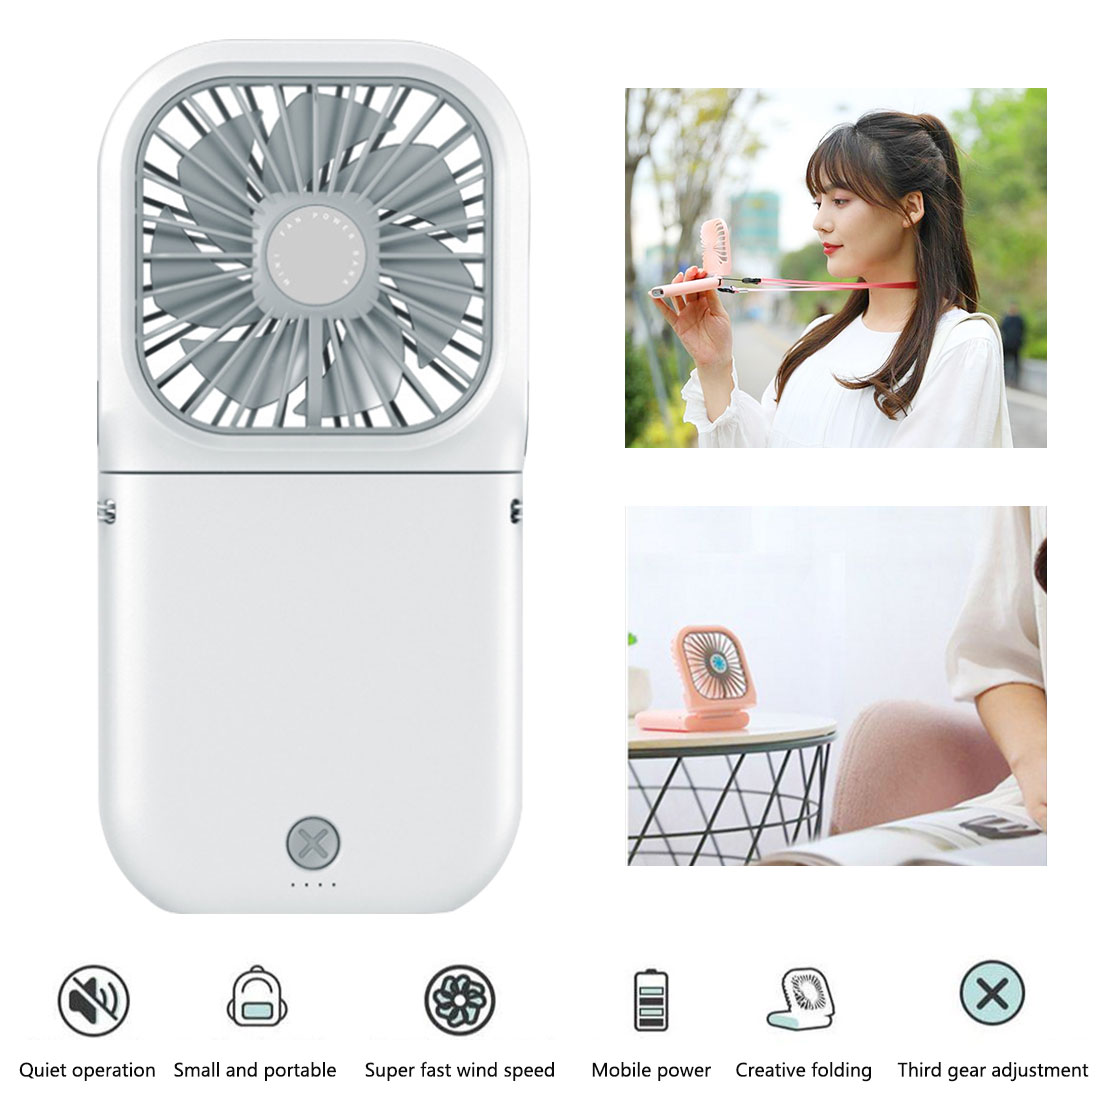 Mini ventilador USB de bolsillo plegable, ventilador de refrigeración portátil recargable de aire pequeño, ventilador de aire Personal, ventilador de aire para el hogar o al aire libre